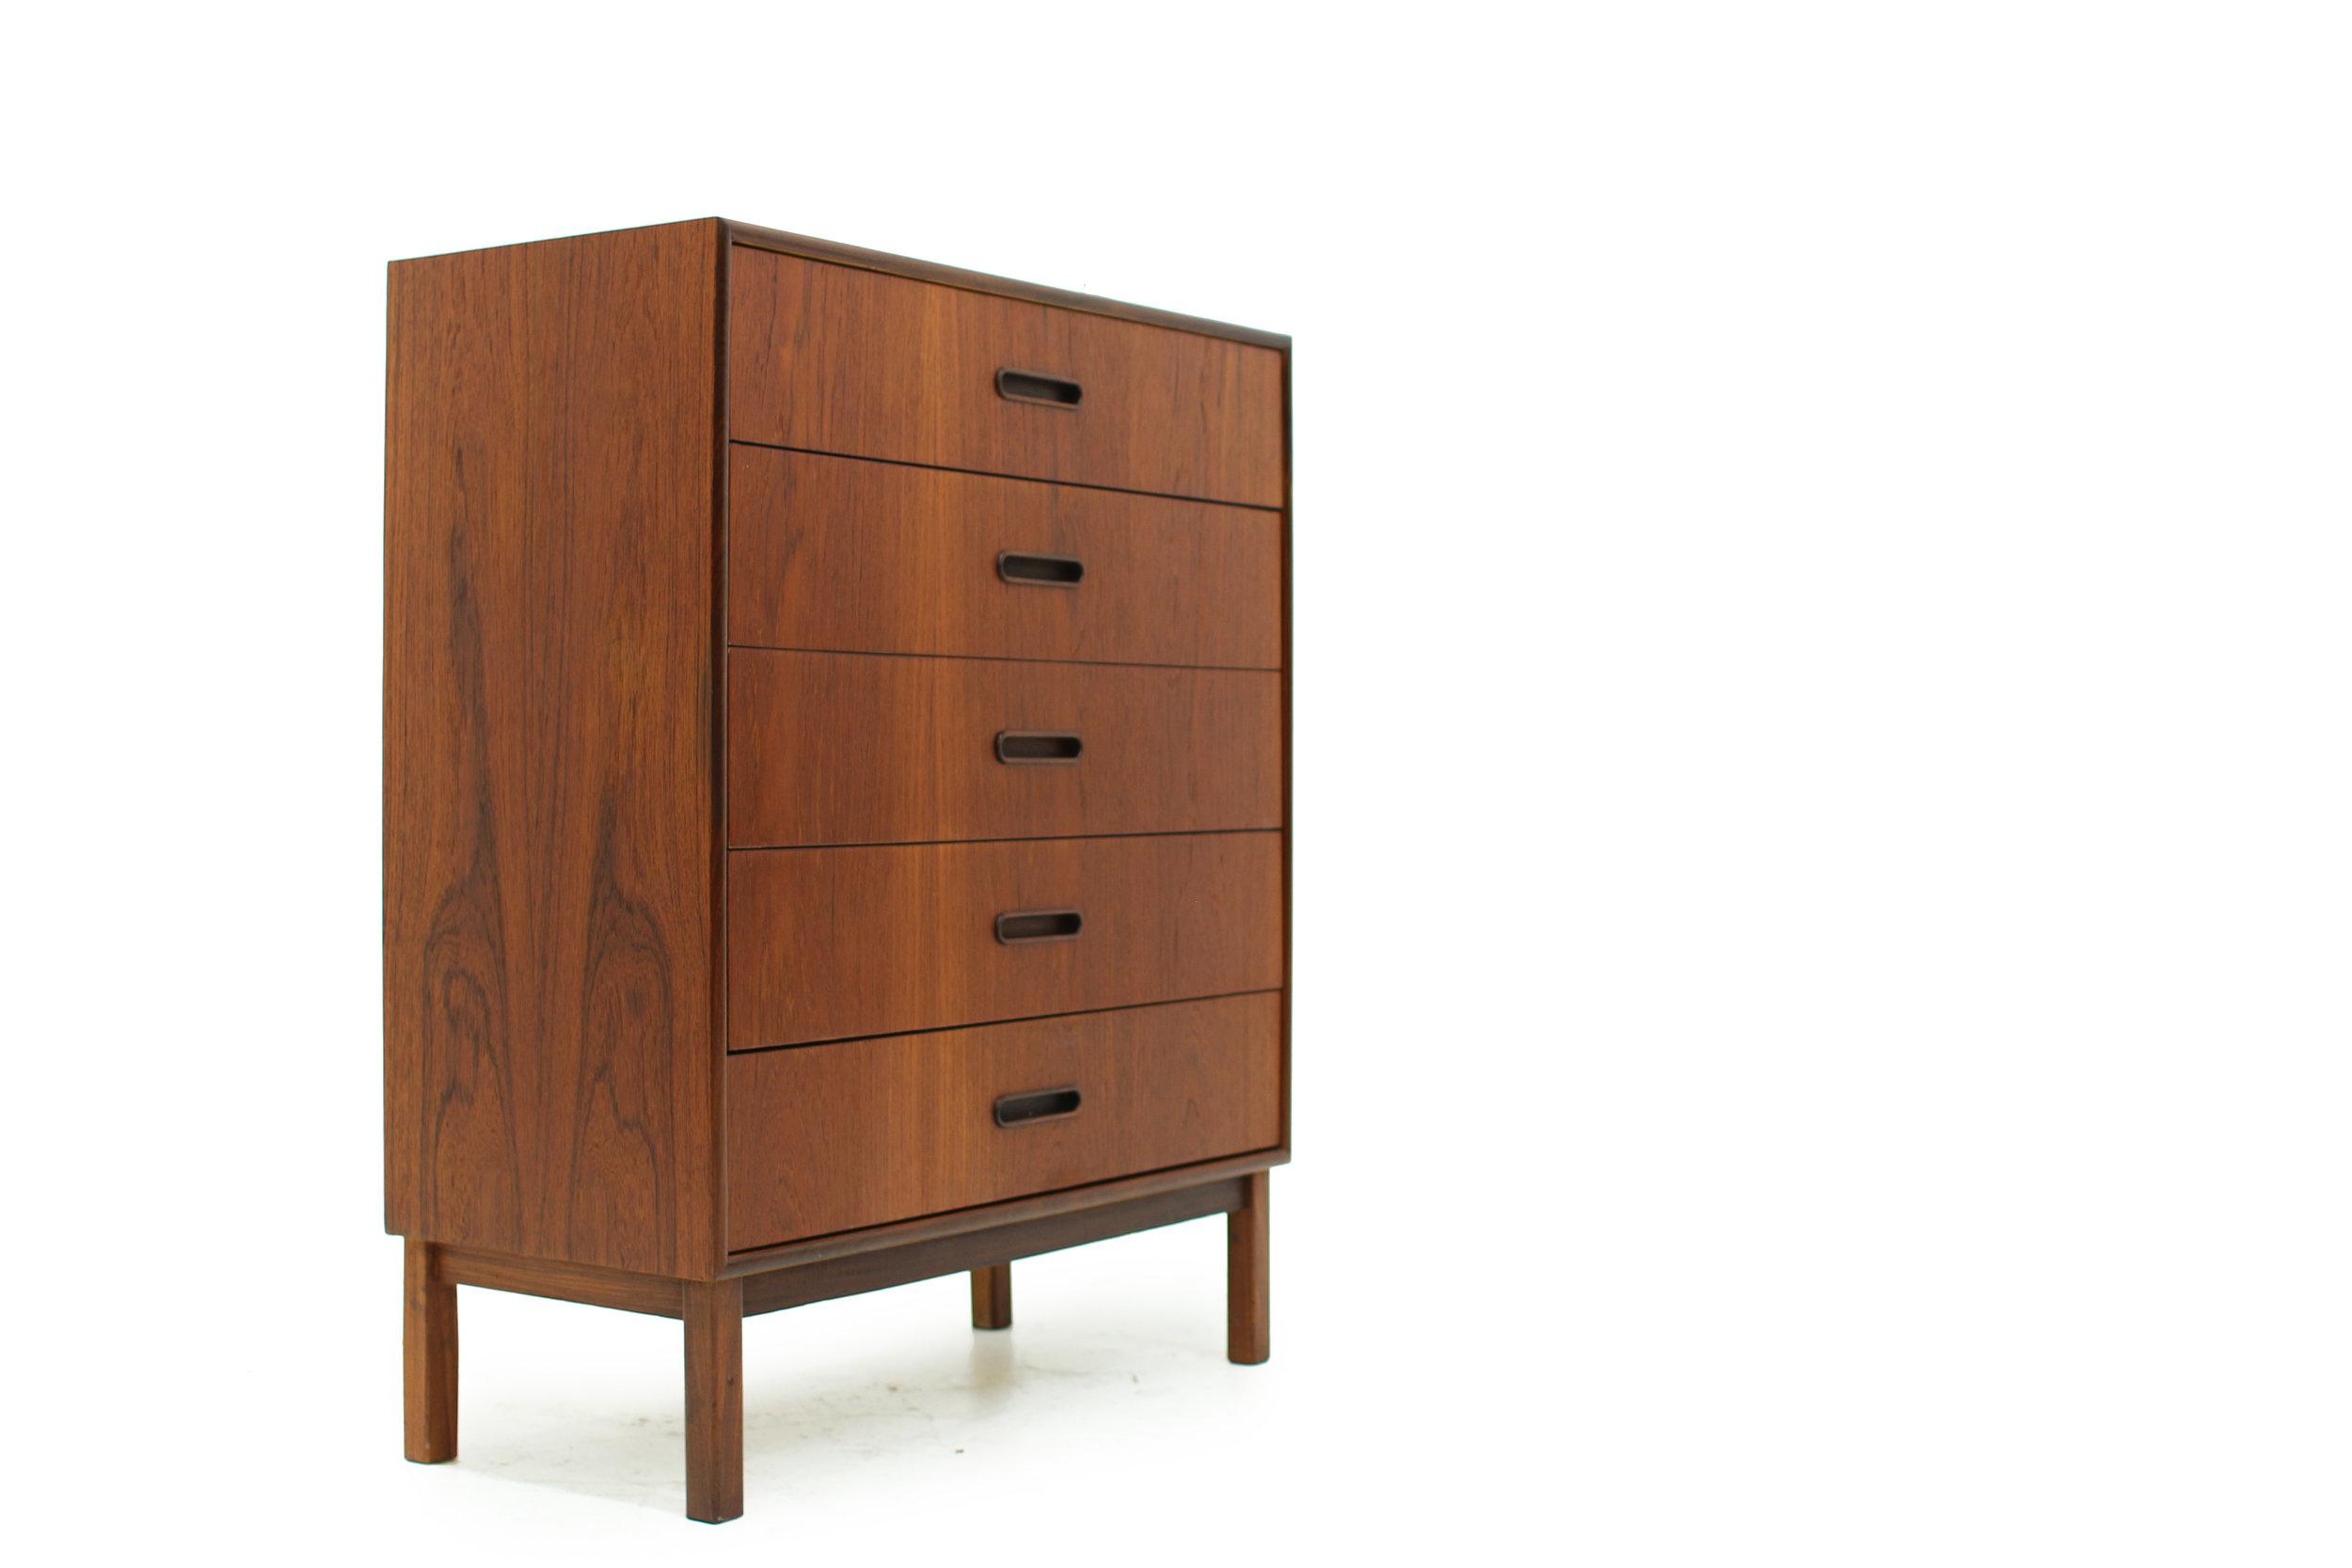 MCM Teak Tallboy Dresser made by Punch Design (3).jpg